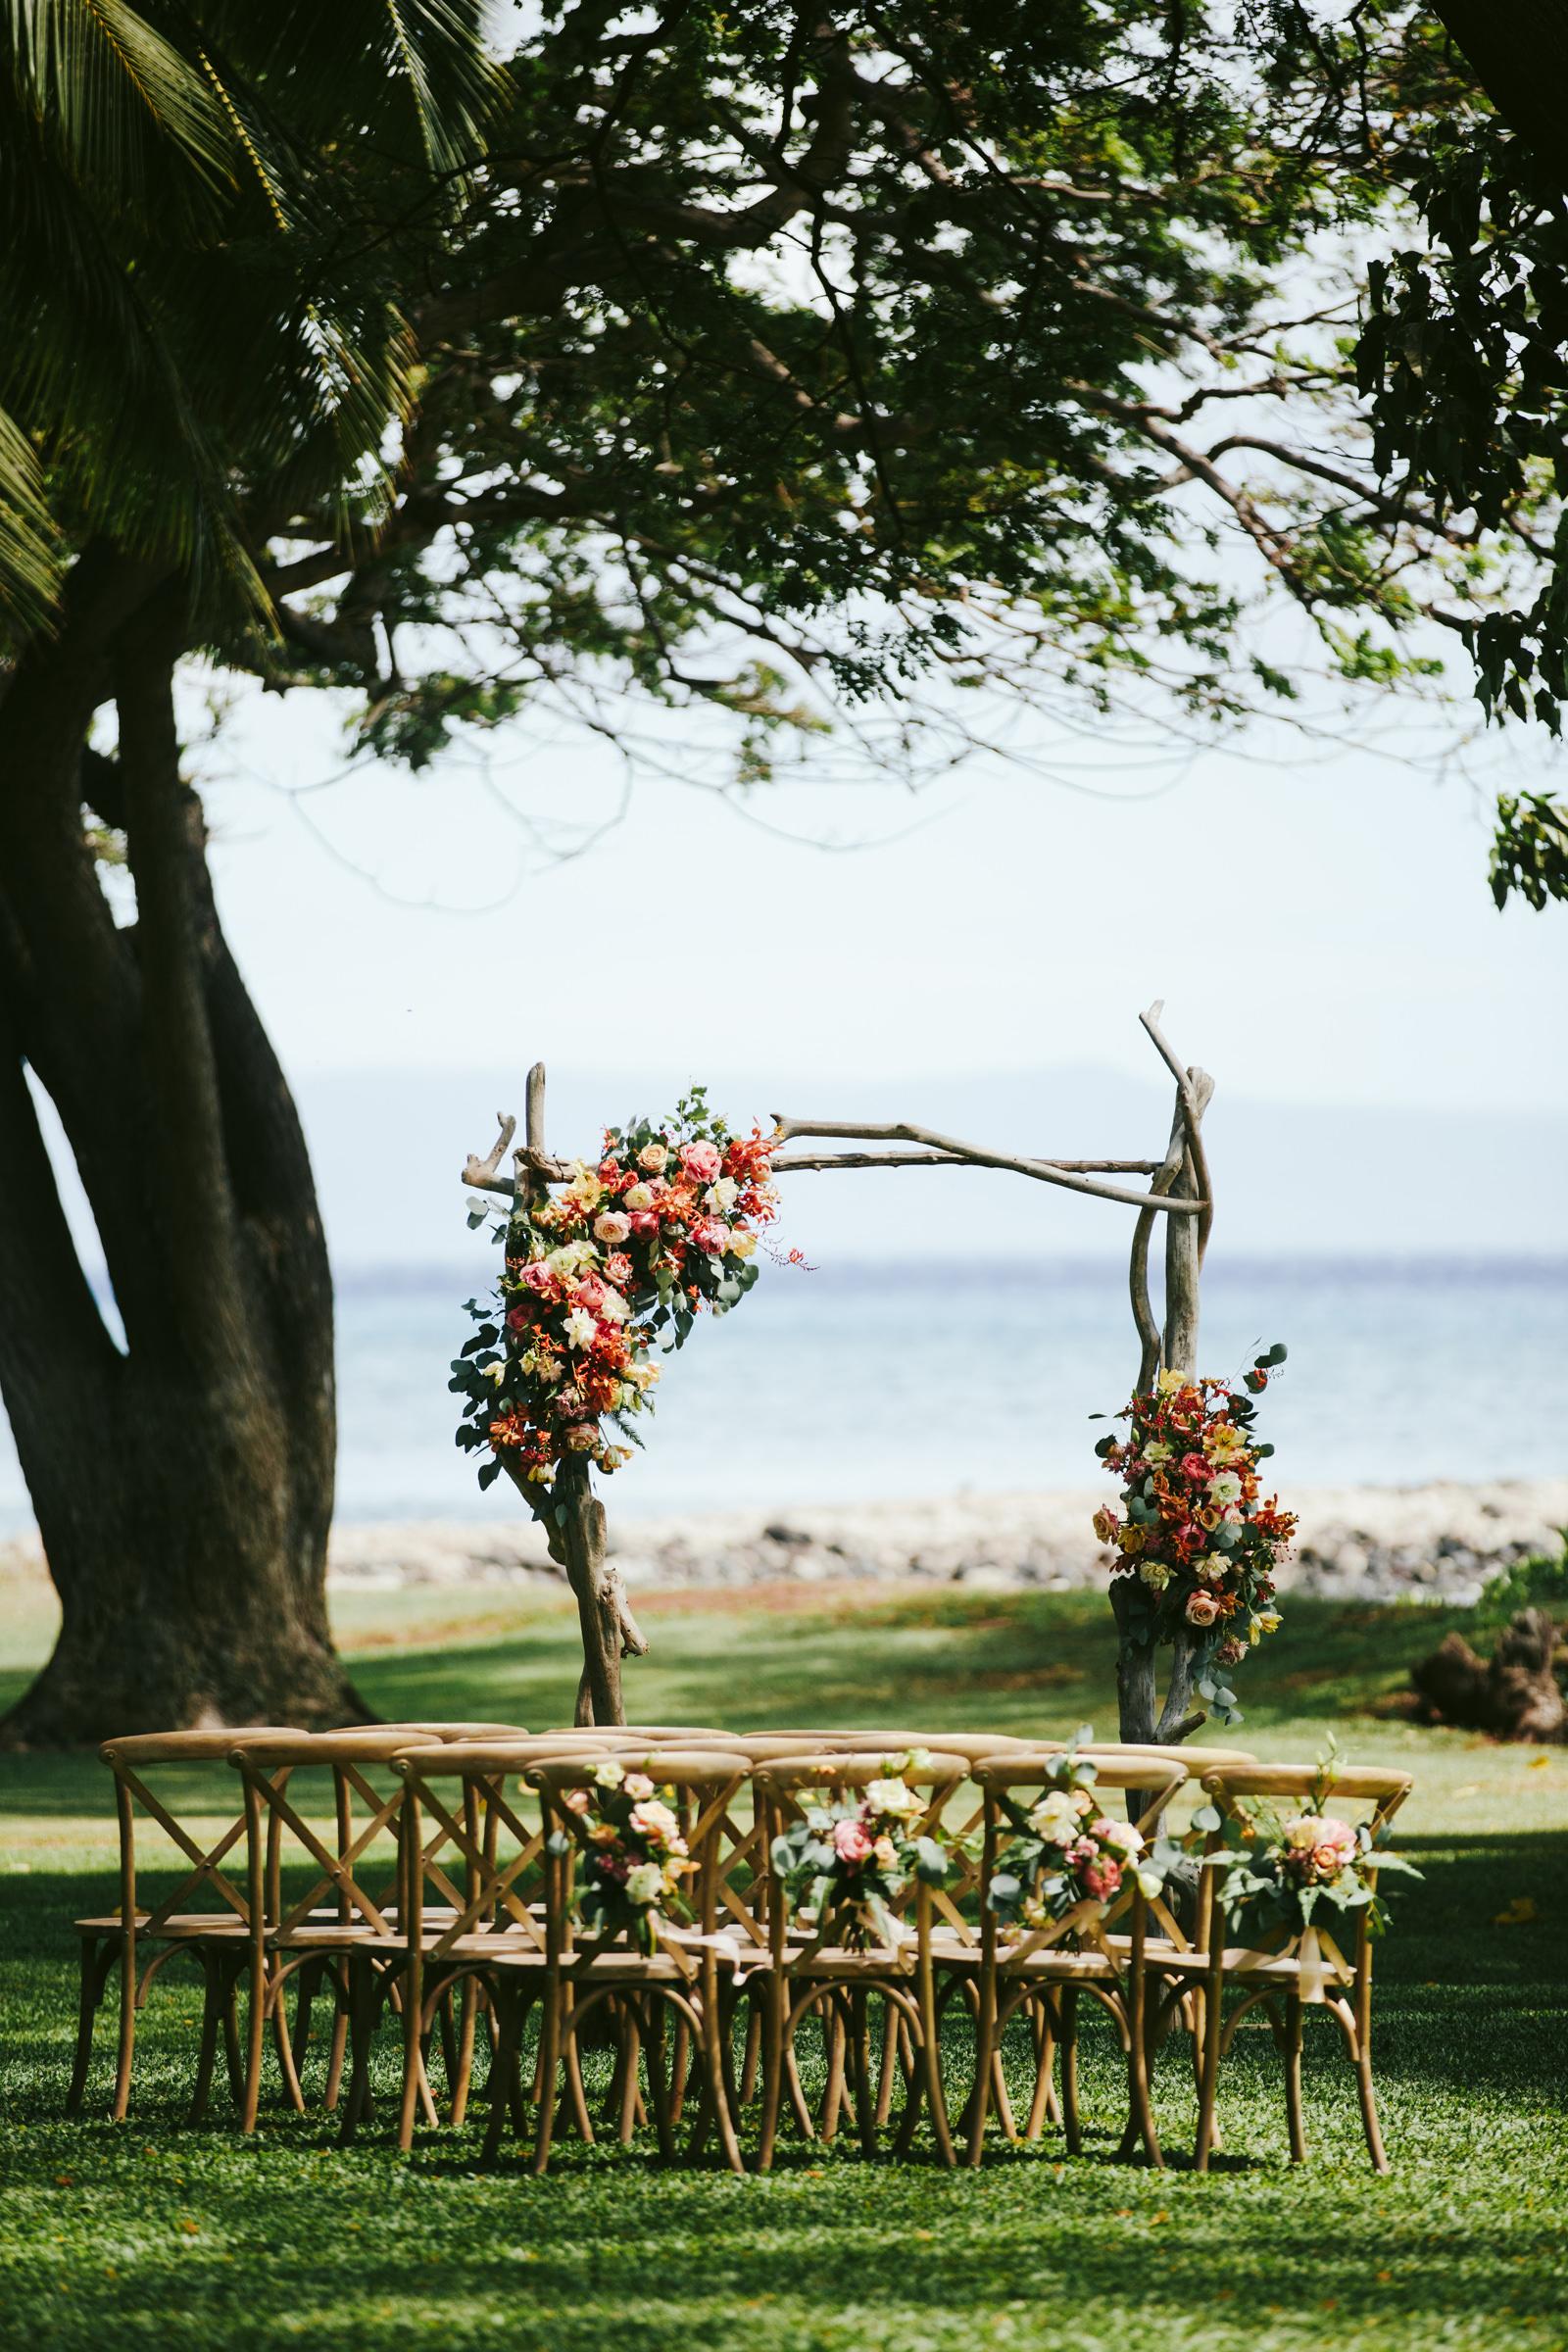 Olowalu Plantain House wedding arbor and ceremony seating - photo by Melia Lucida